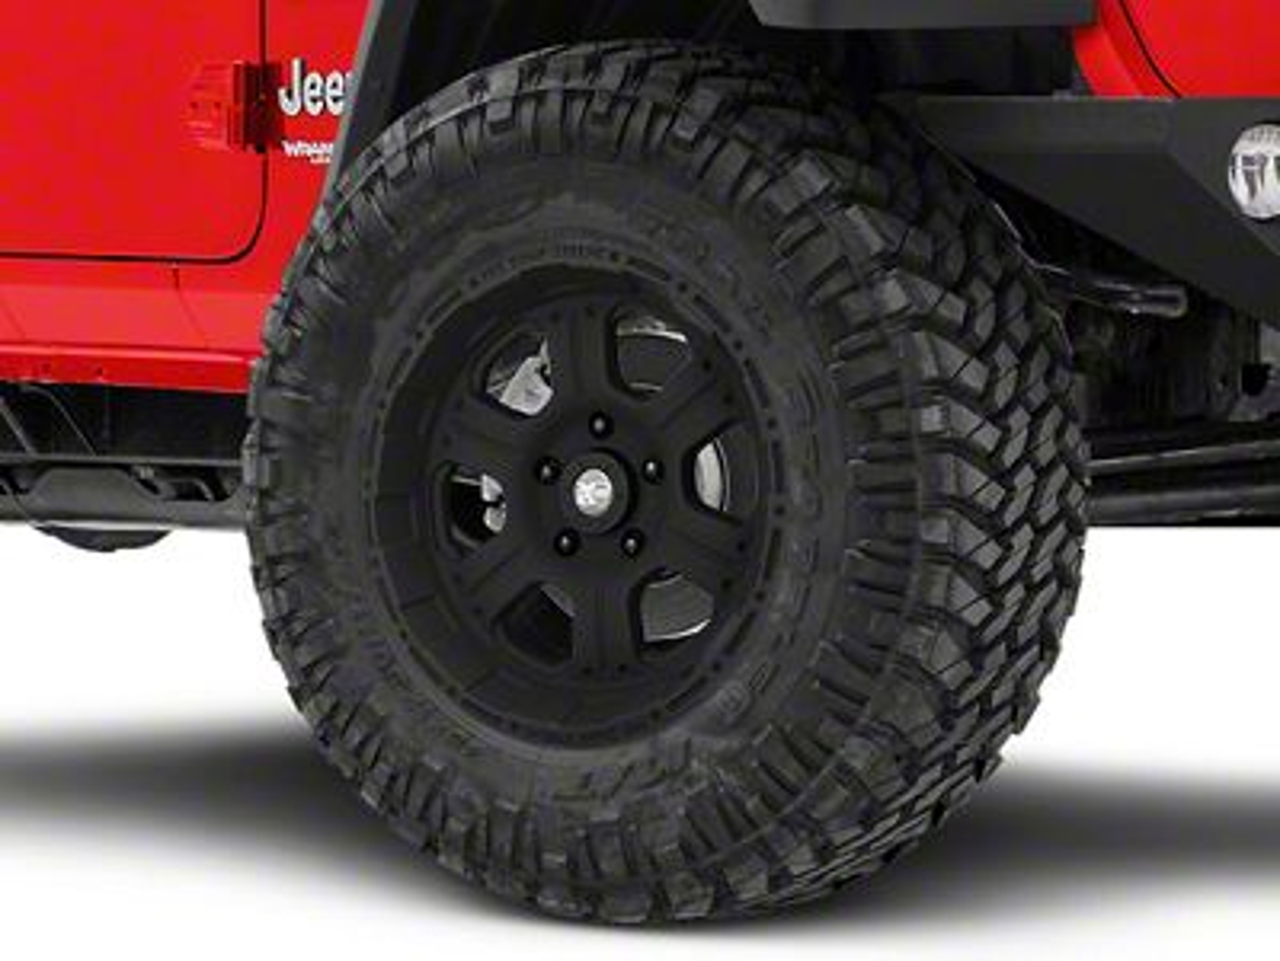 Pro Comp Alloy Series 7089 Flat Black Wheel - 17x9 (18-19 Jeep Wrangler JL)